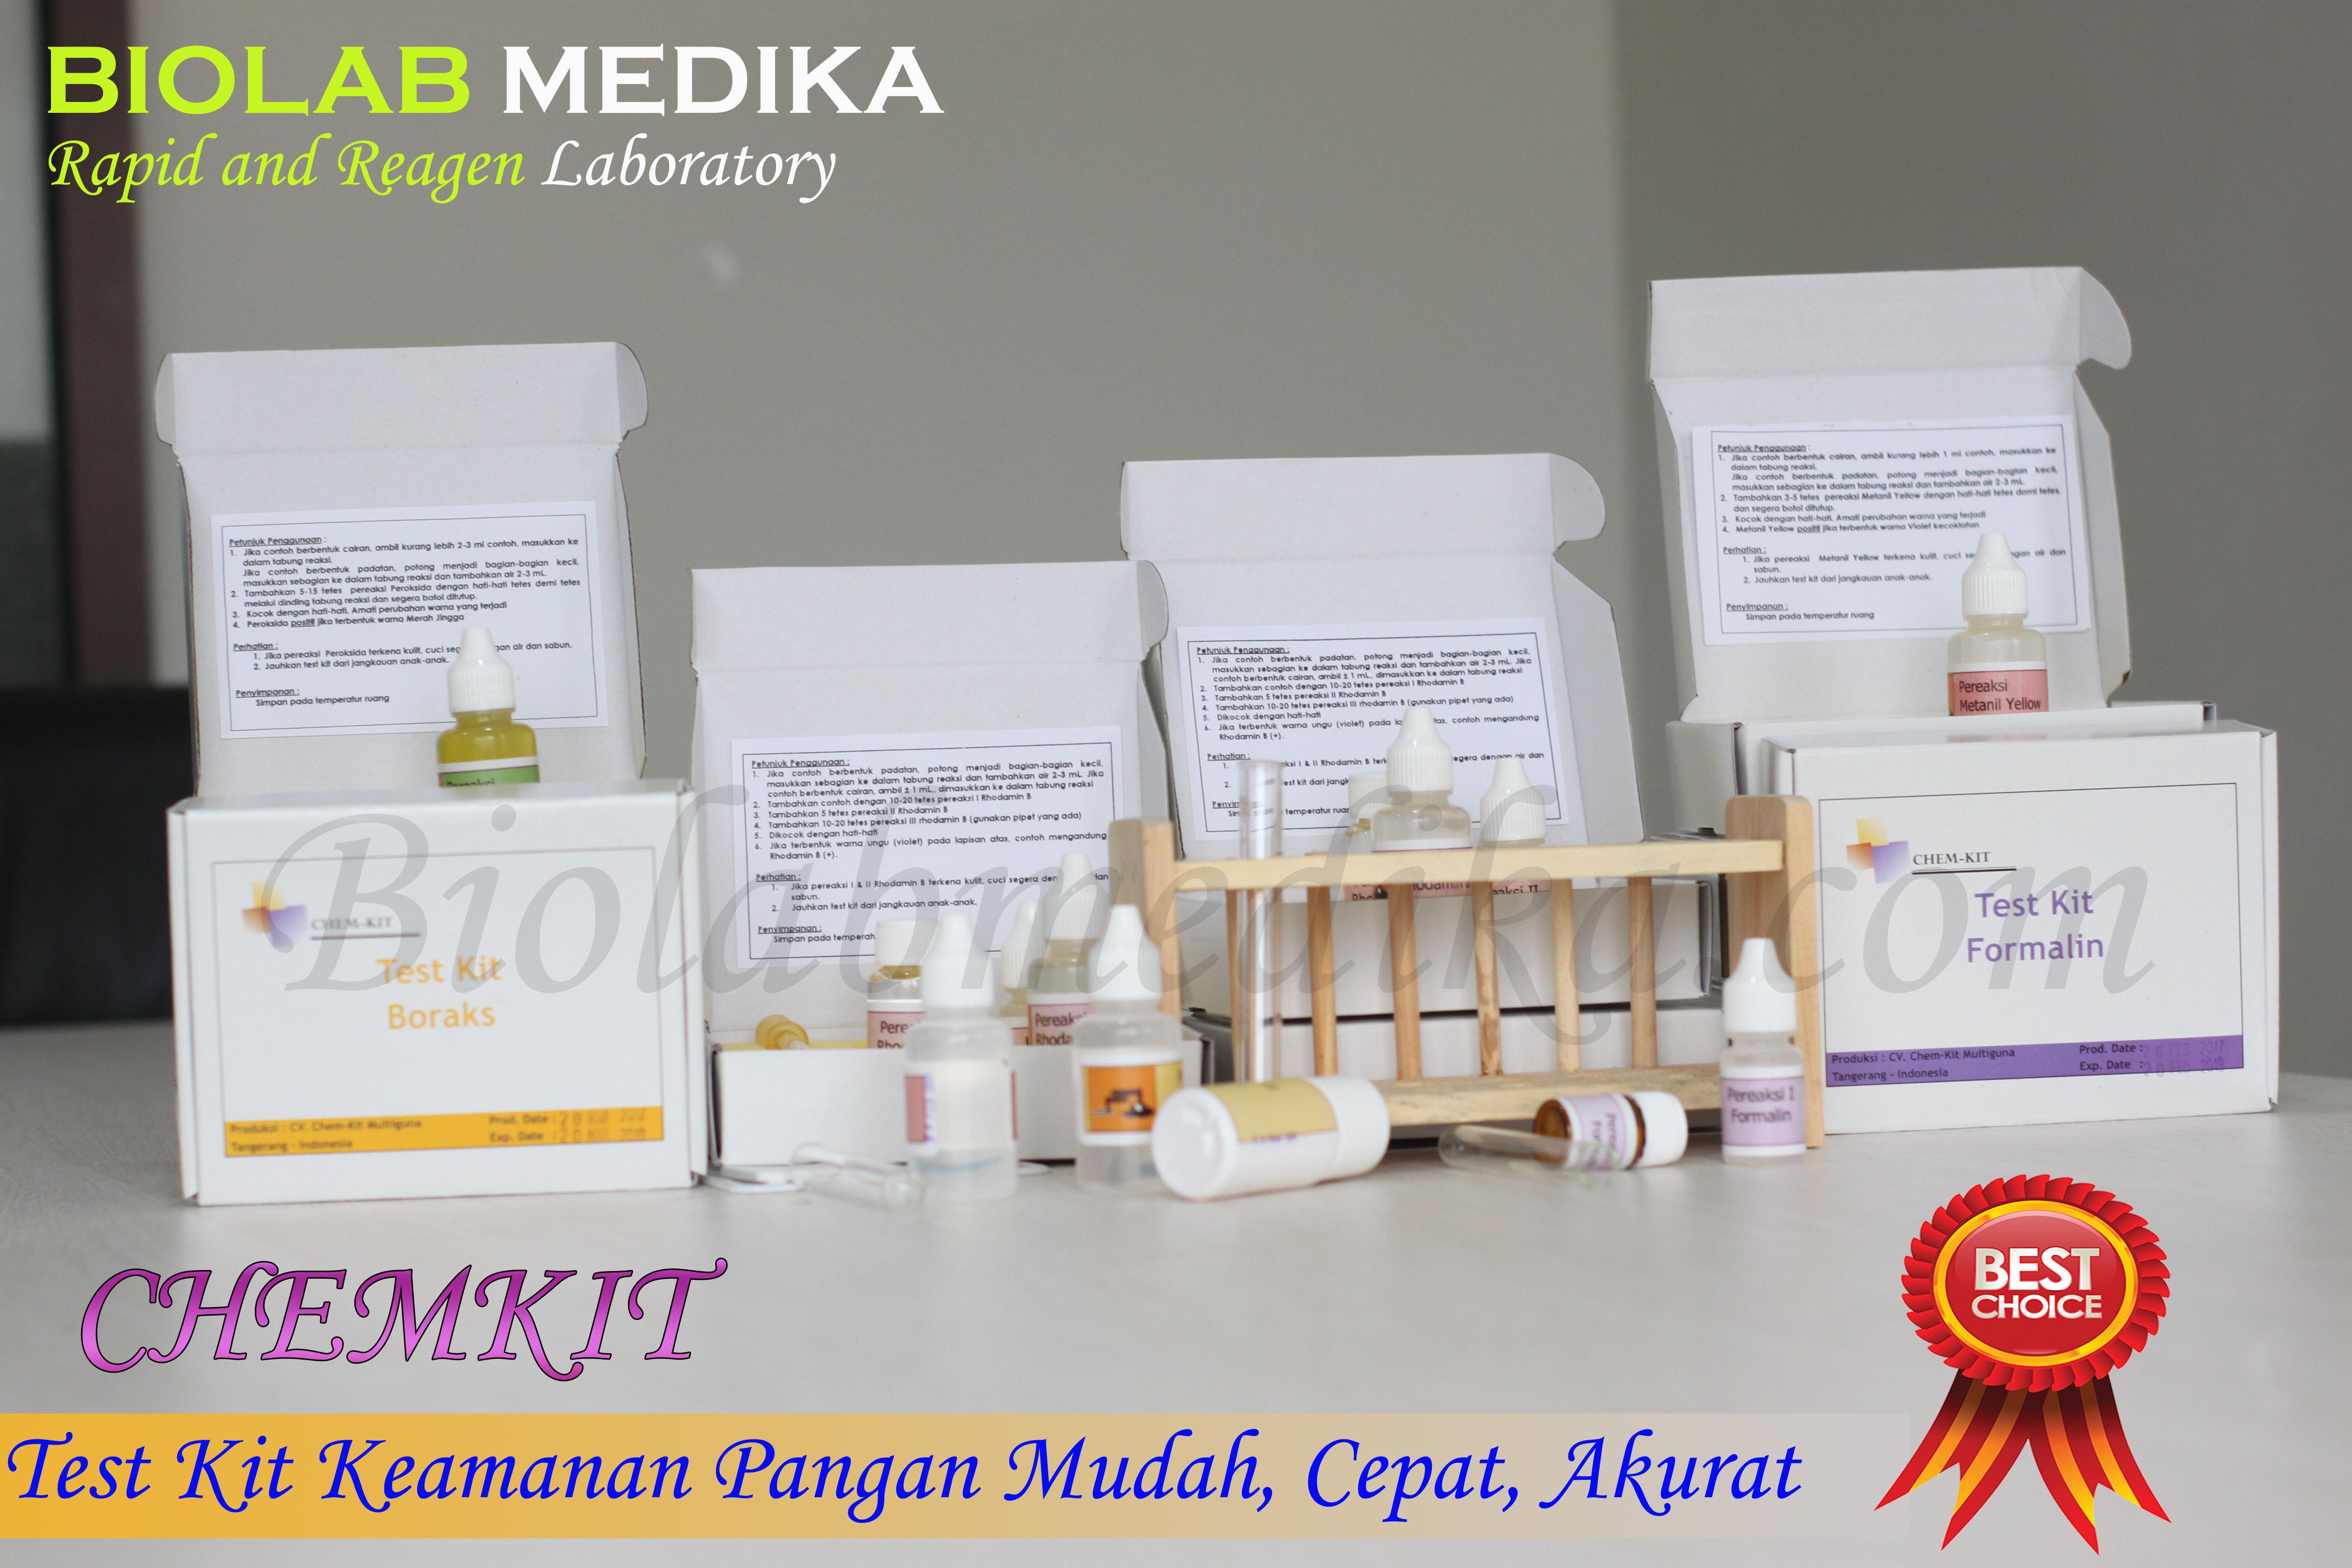 Test Kit Chemkit Murah